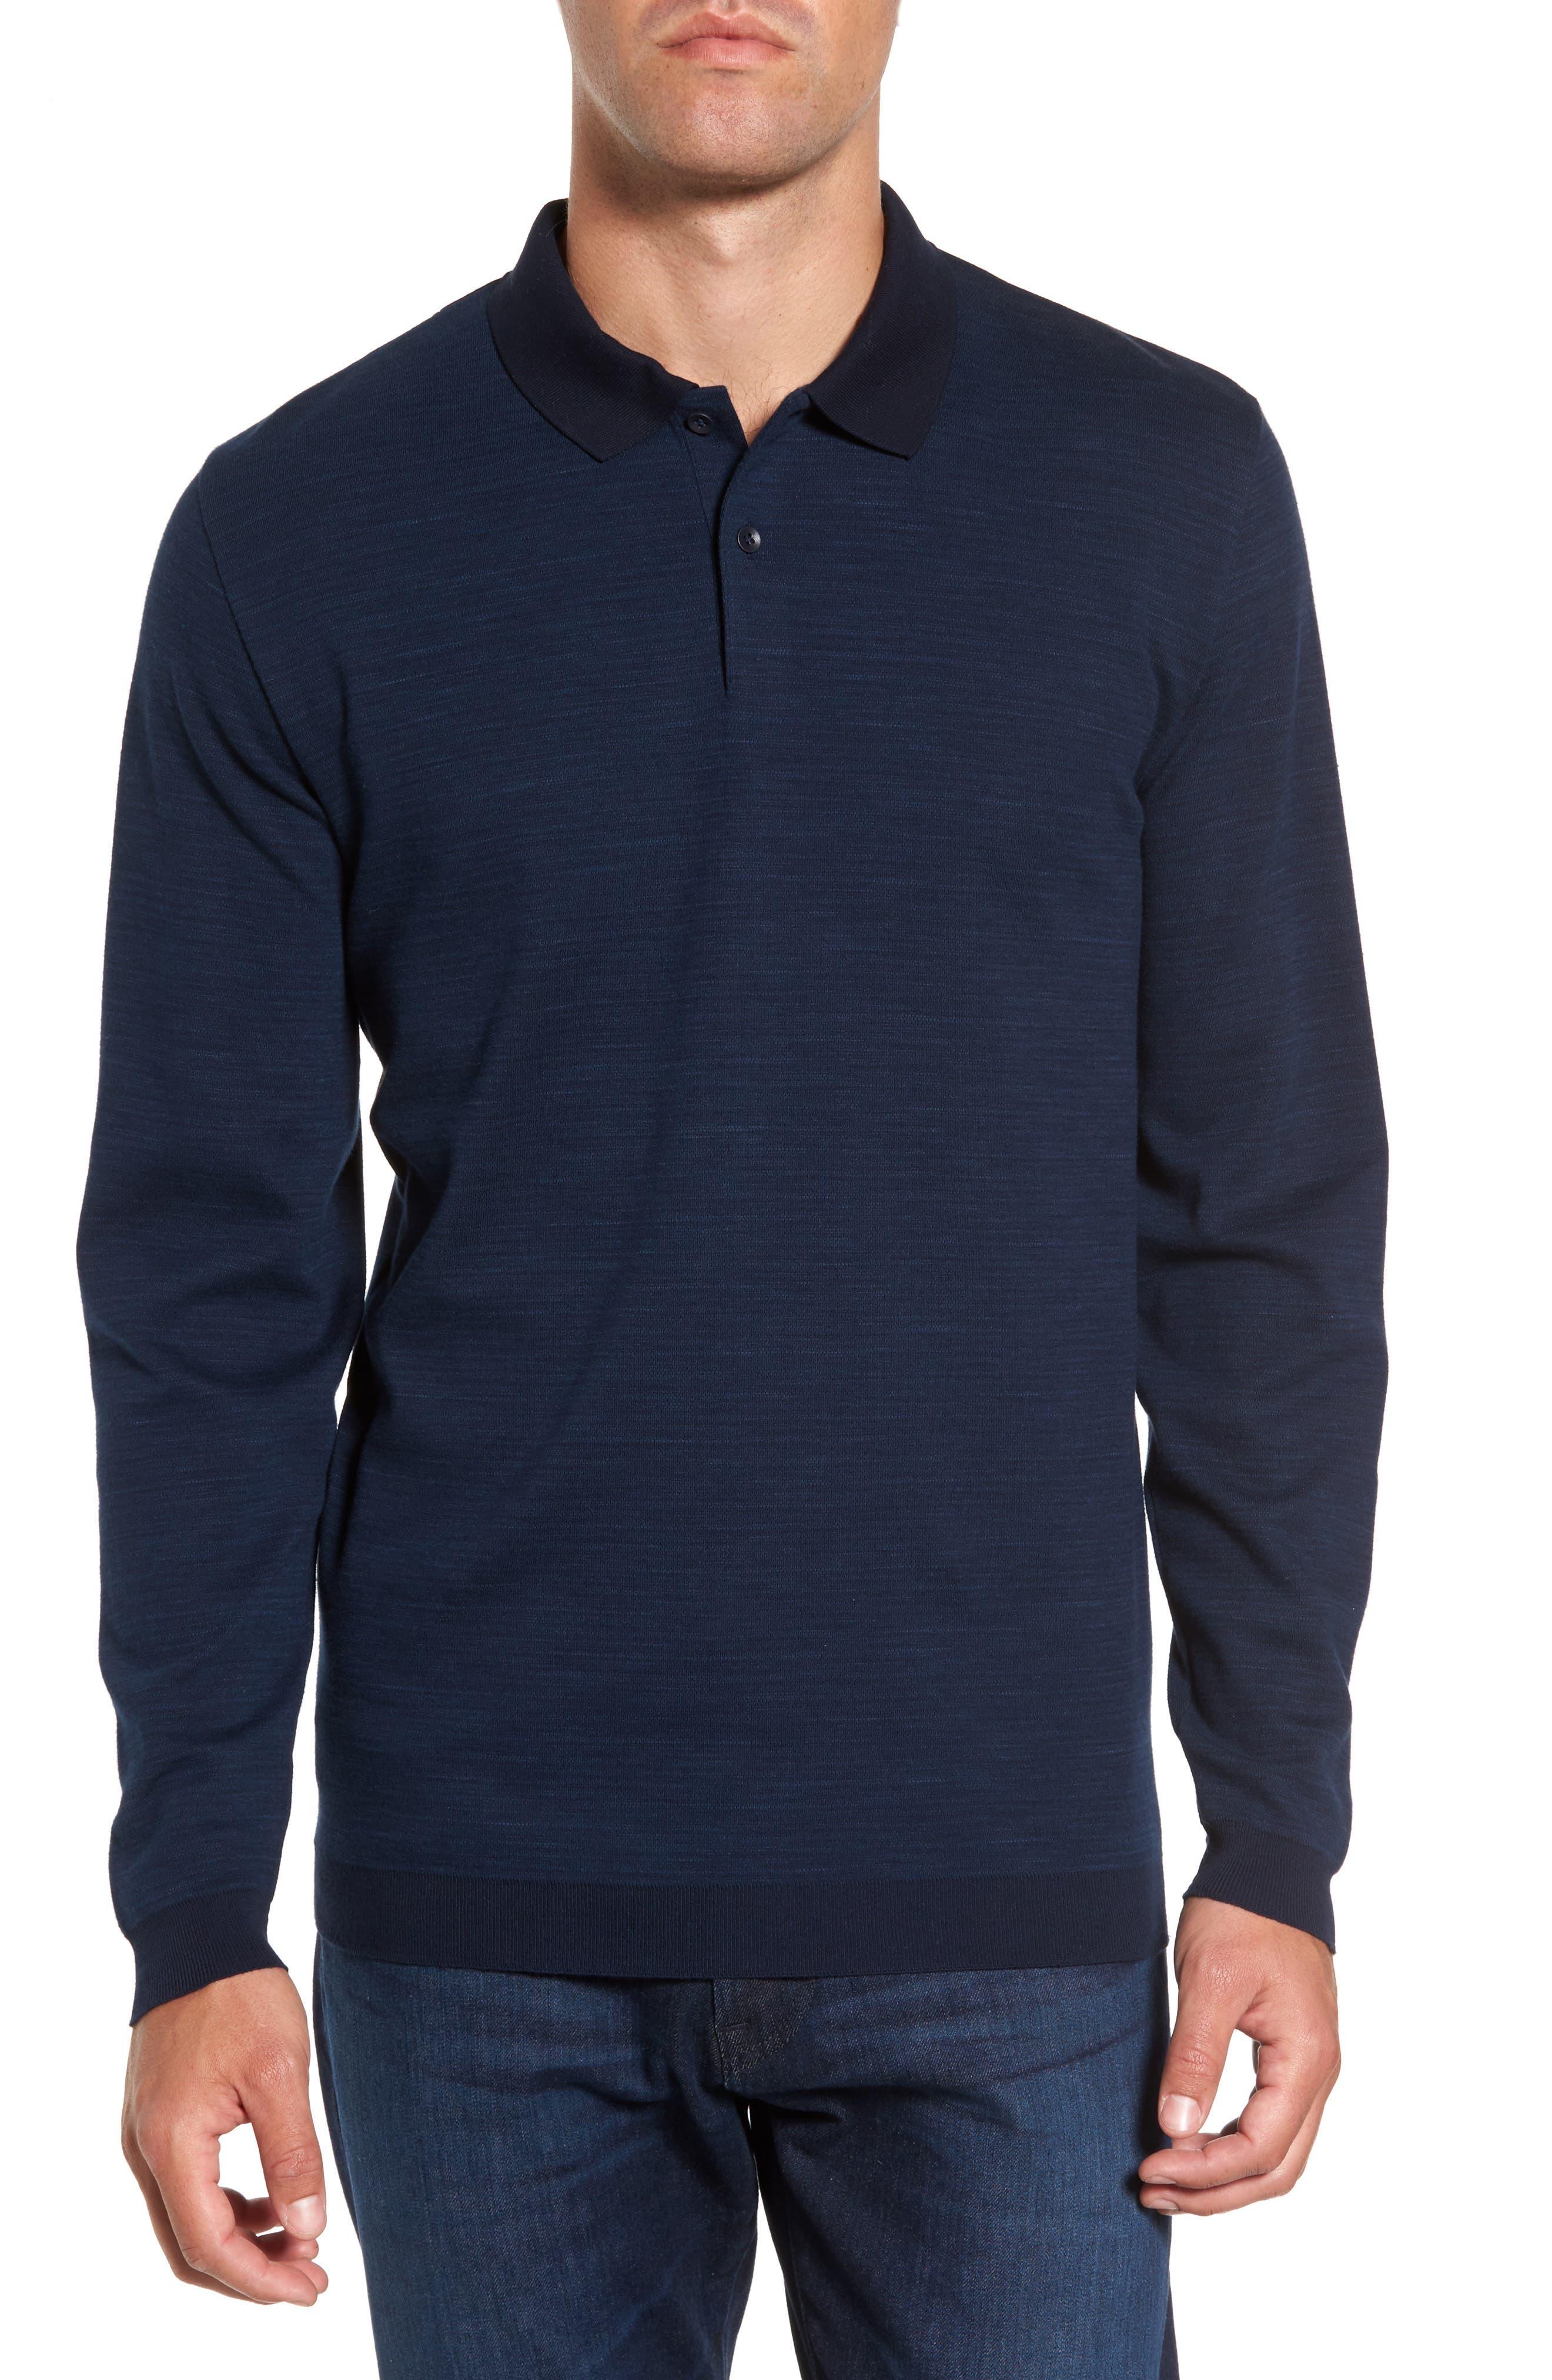 Main Image - Rodd & Gunn Shelton Cotton Sweater